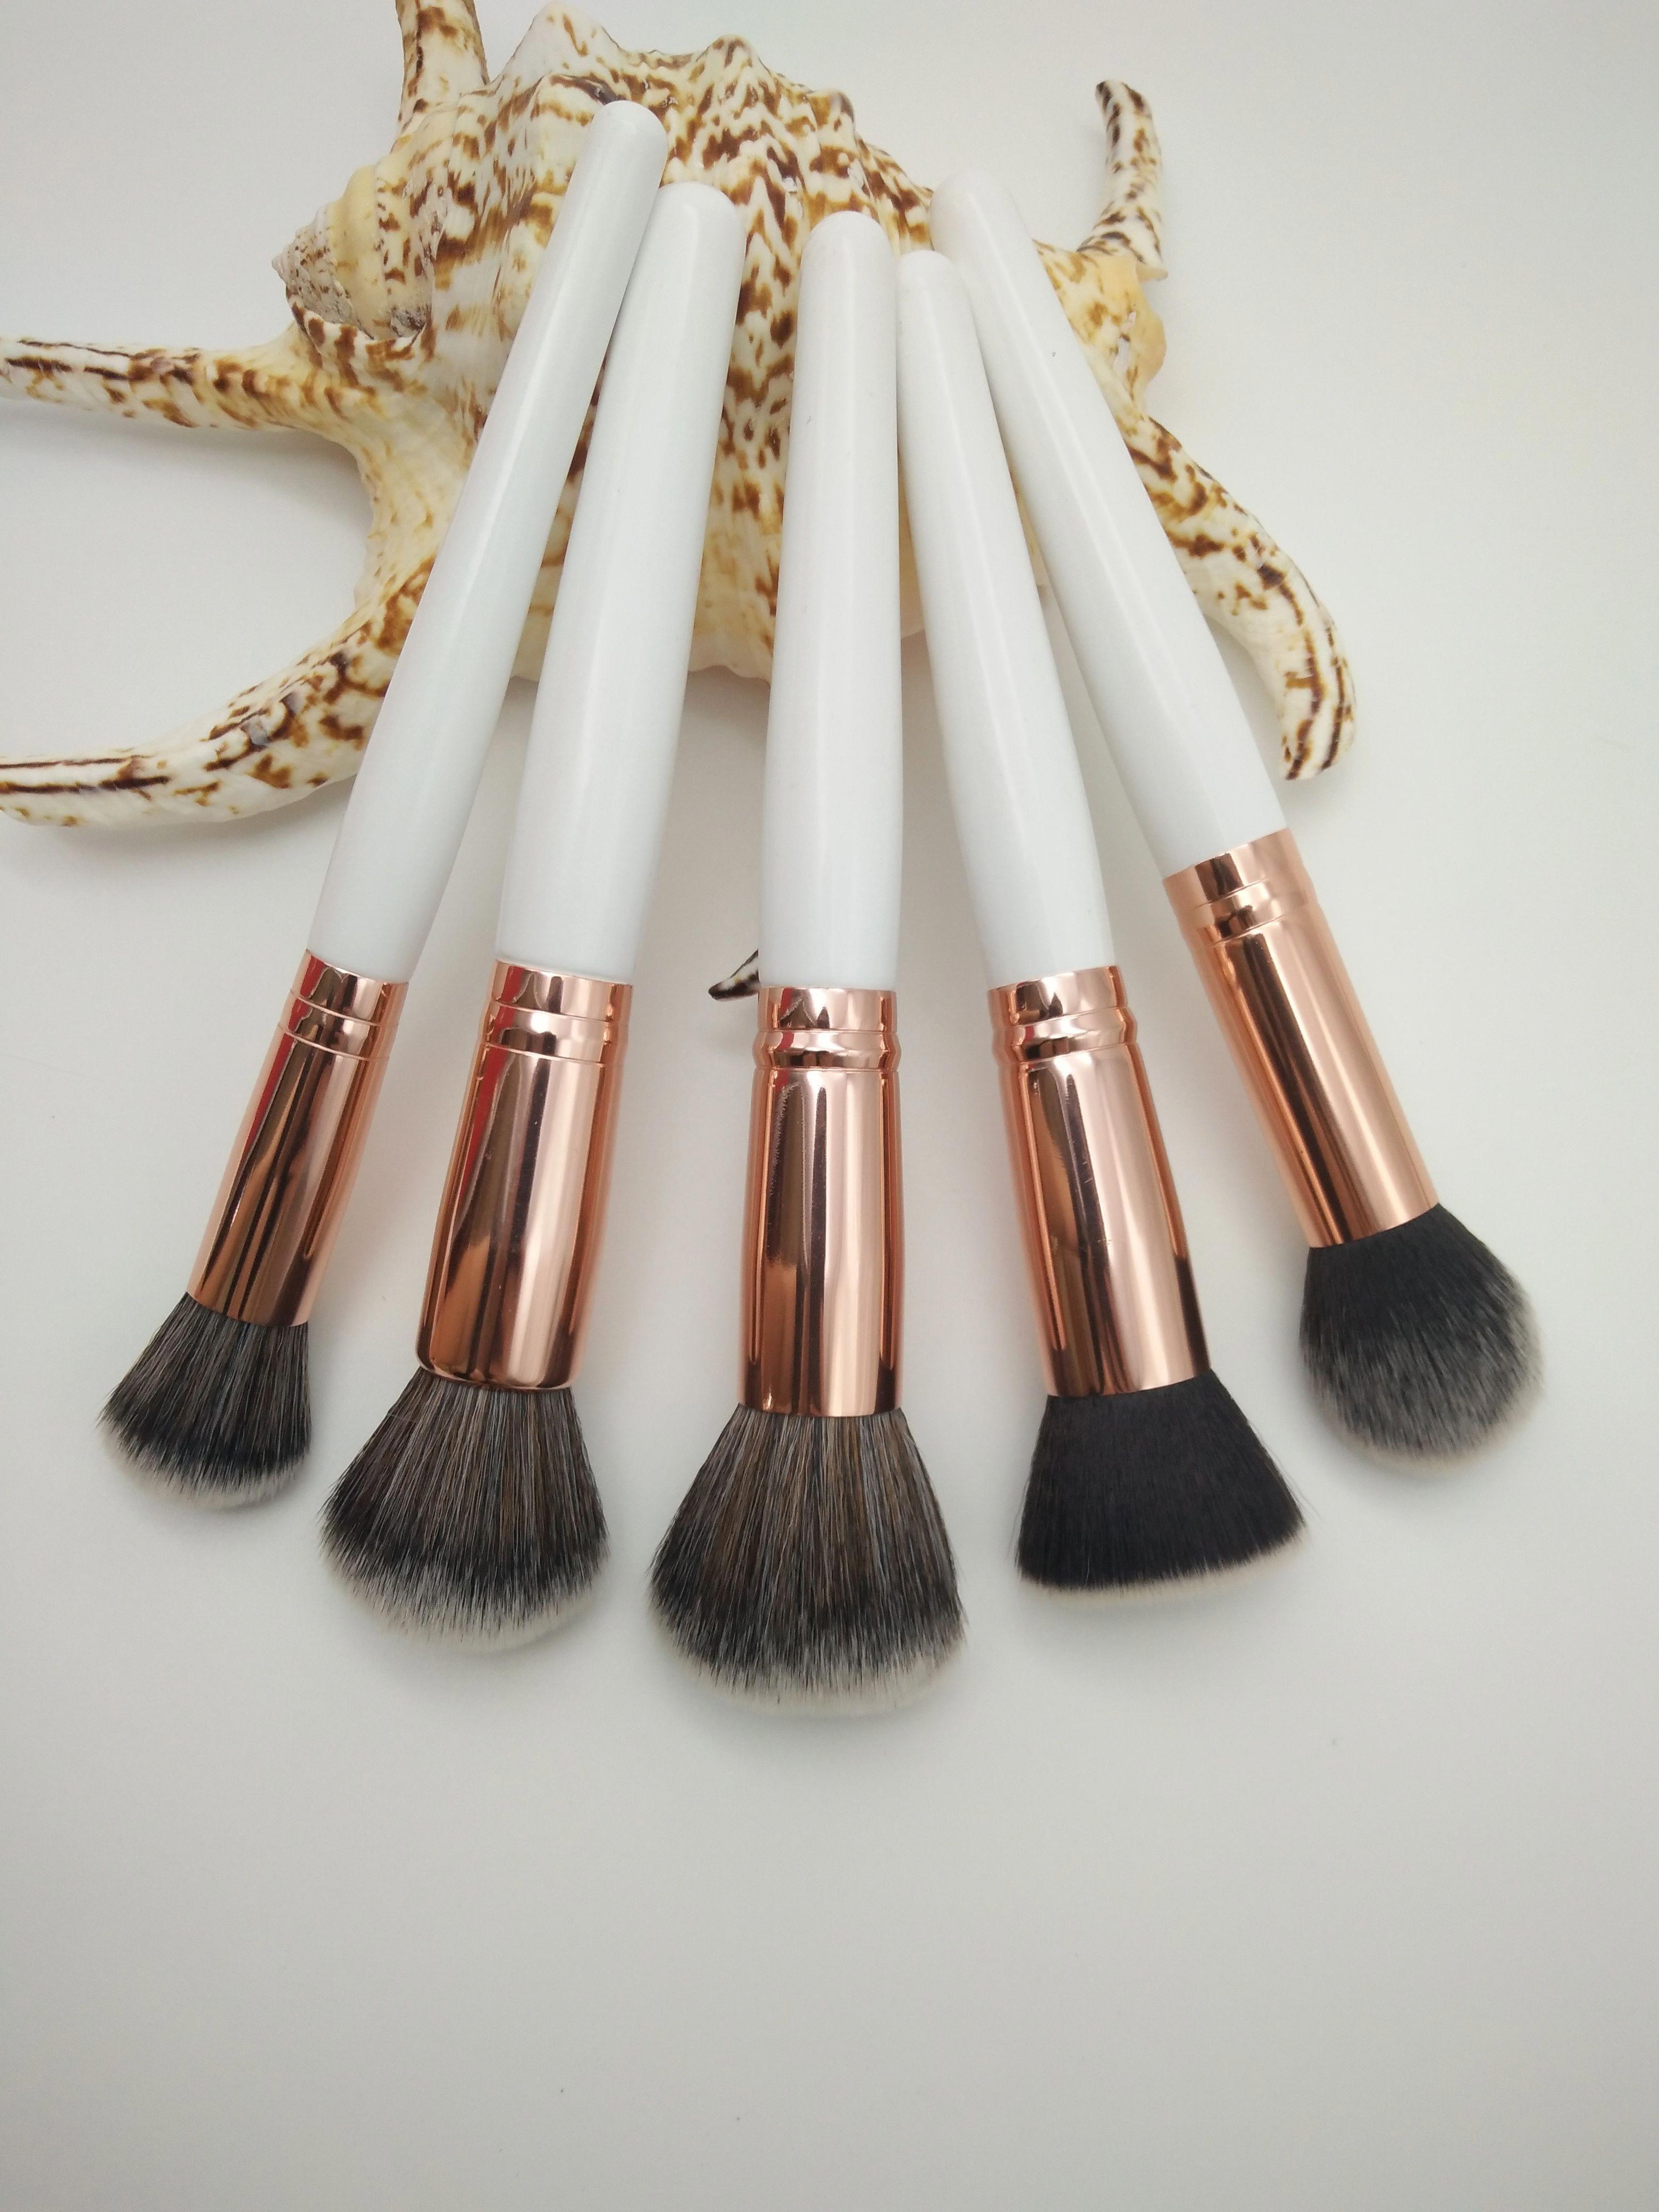 8c0e165f Customized facial makeup brushes set wholesale~ inquiry: muafan@aliyun.com  Whatspp/wechat: 86 13424200883 #makeupbrushes #brushes #cosmeticbrushes # beauty # ...